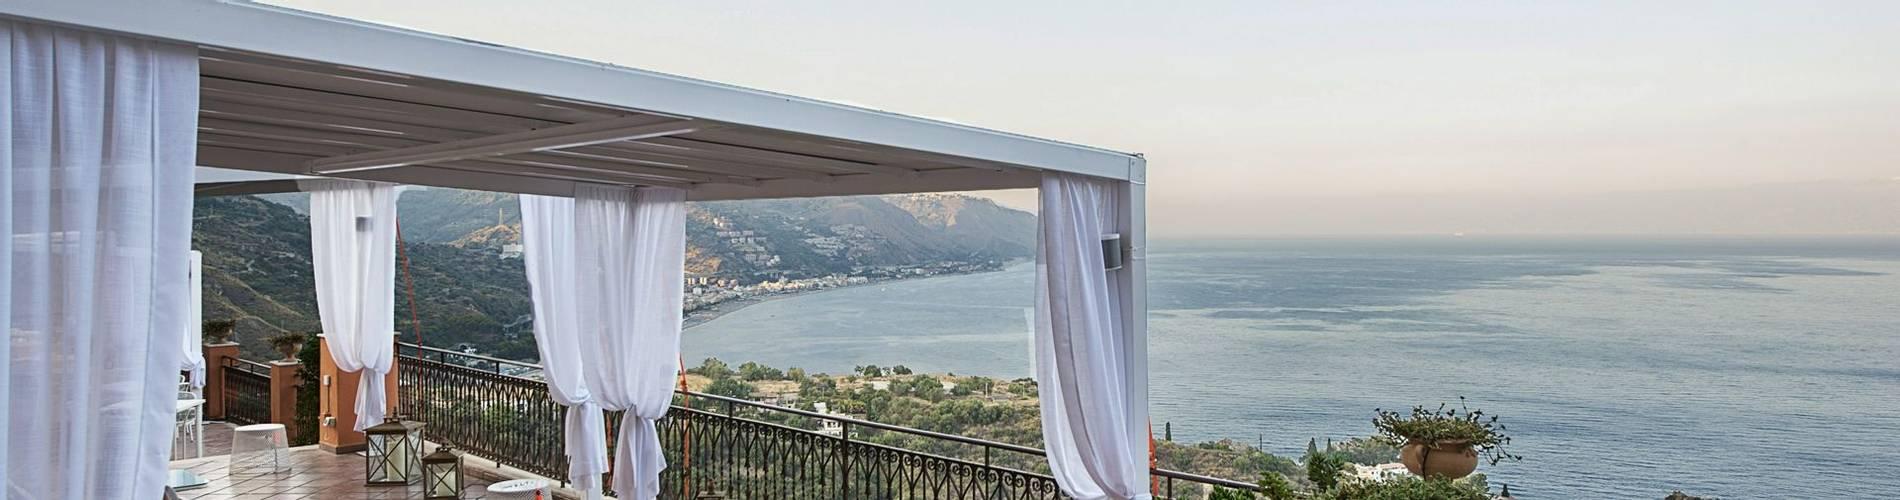 Grand Hotel Miramare, Sicily, Italy (8).jpg